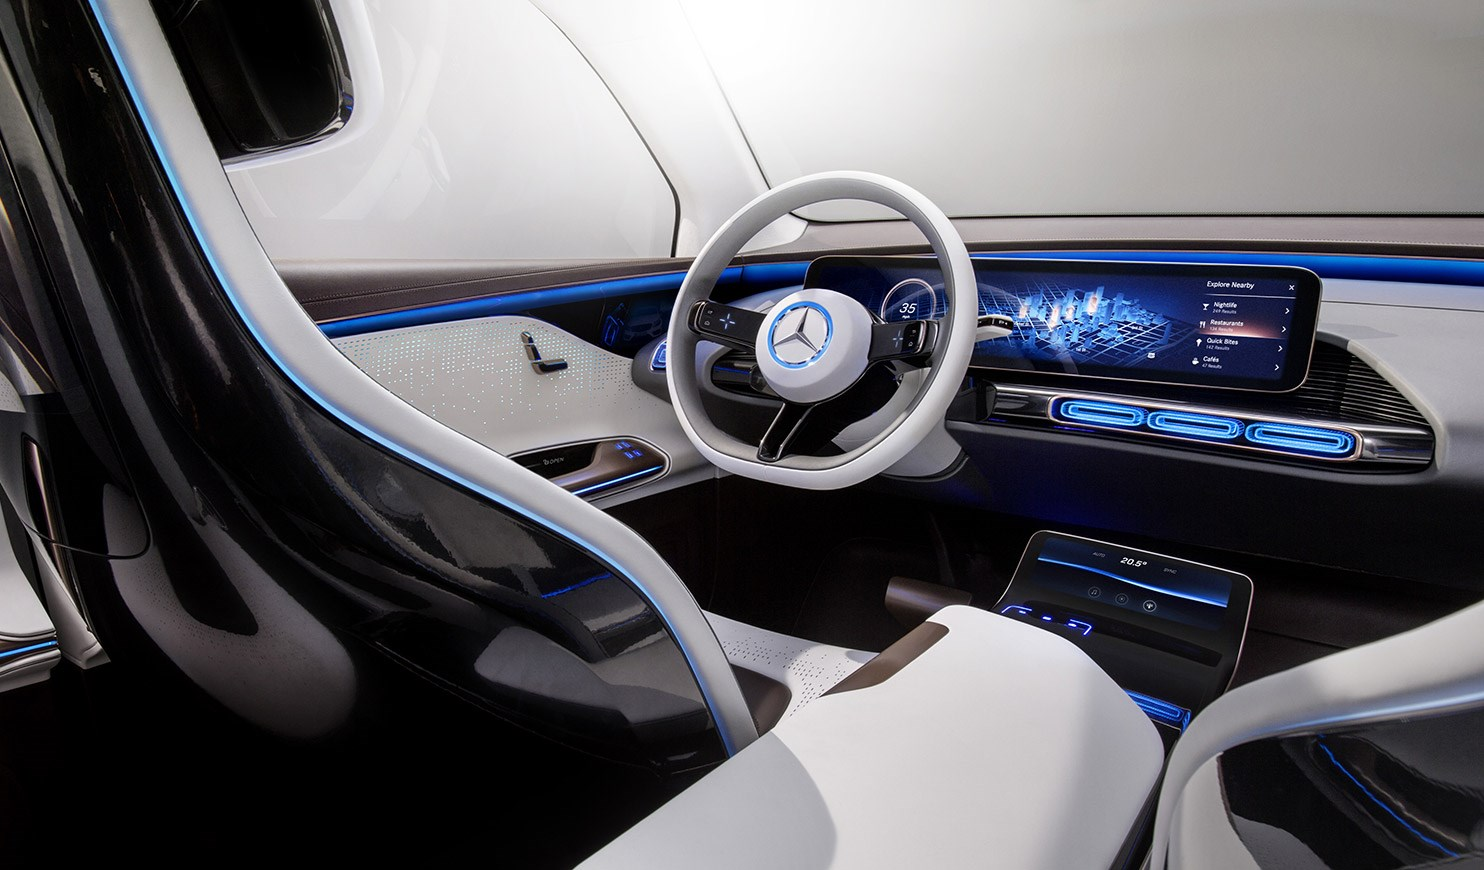 Mercedes Project I Moment Meet The New Generation Eq Electric